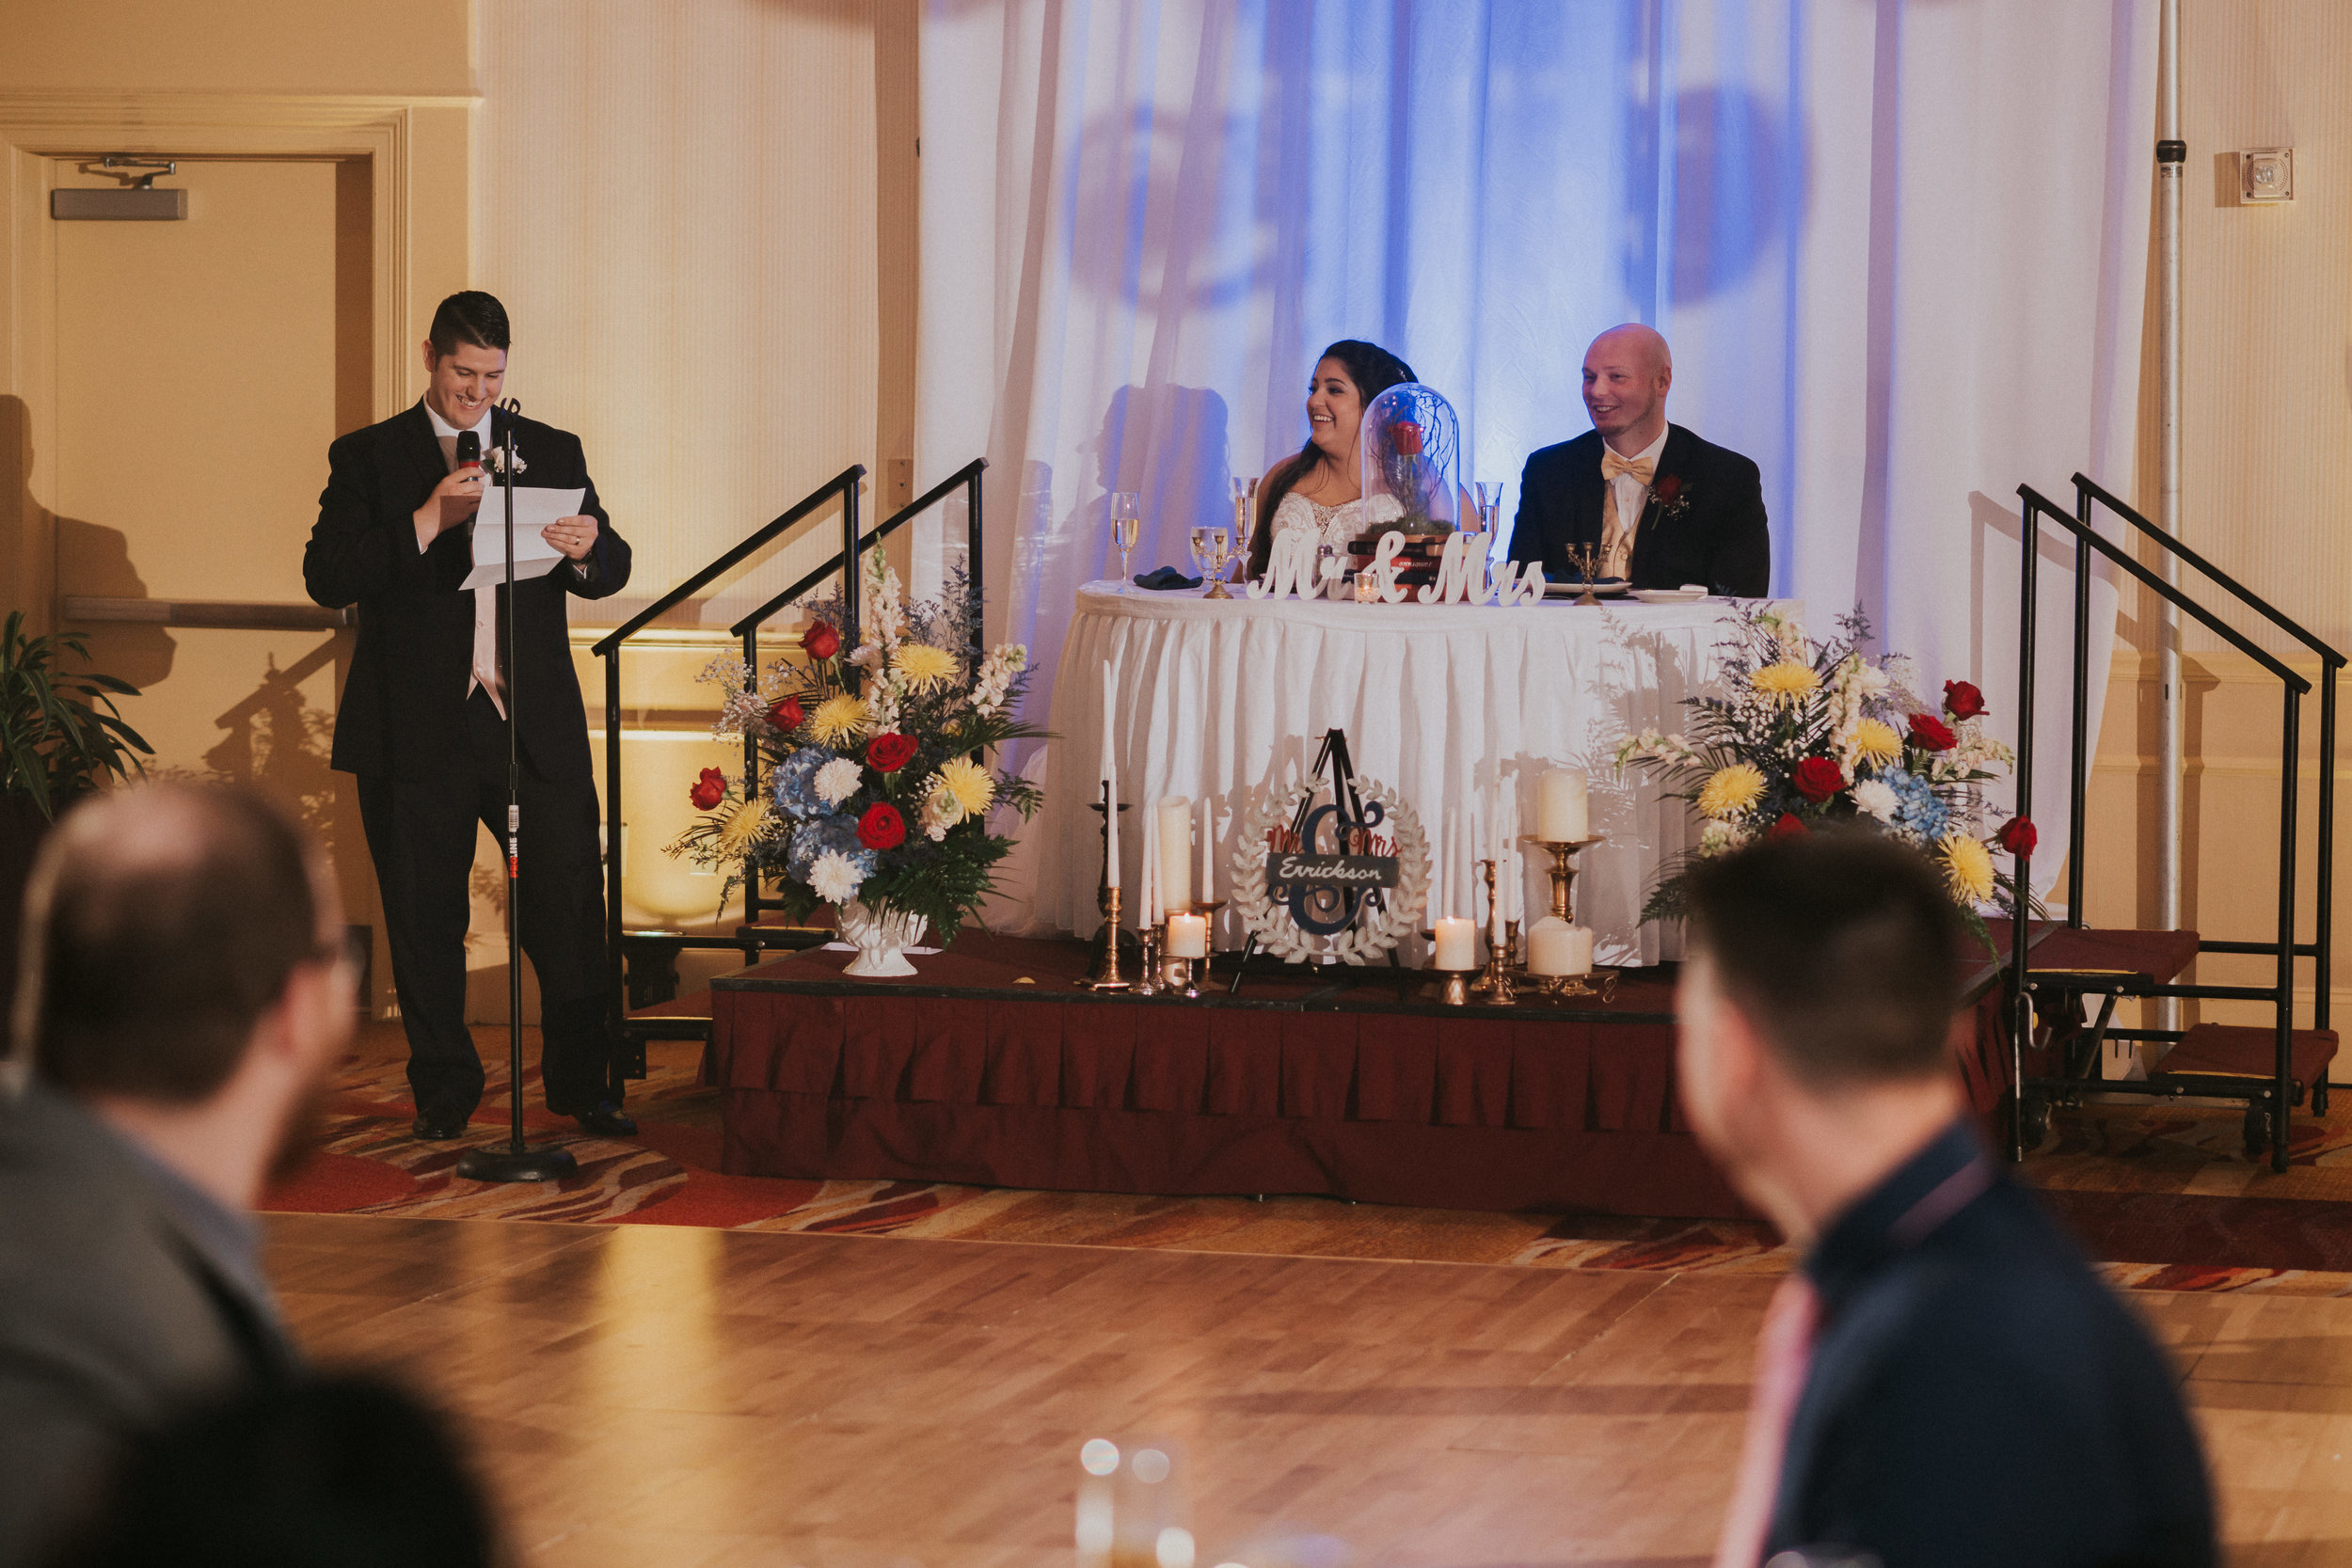 Barclay-Farmstead-Wedding-Rosa-and-Mike-561.jpg